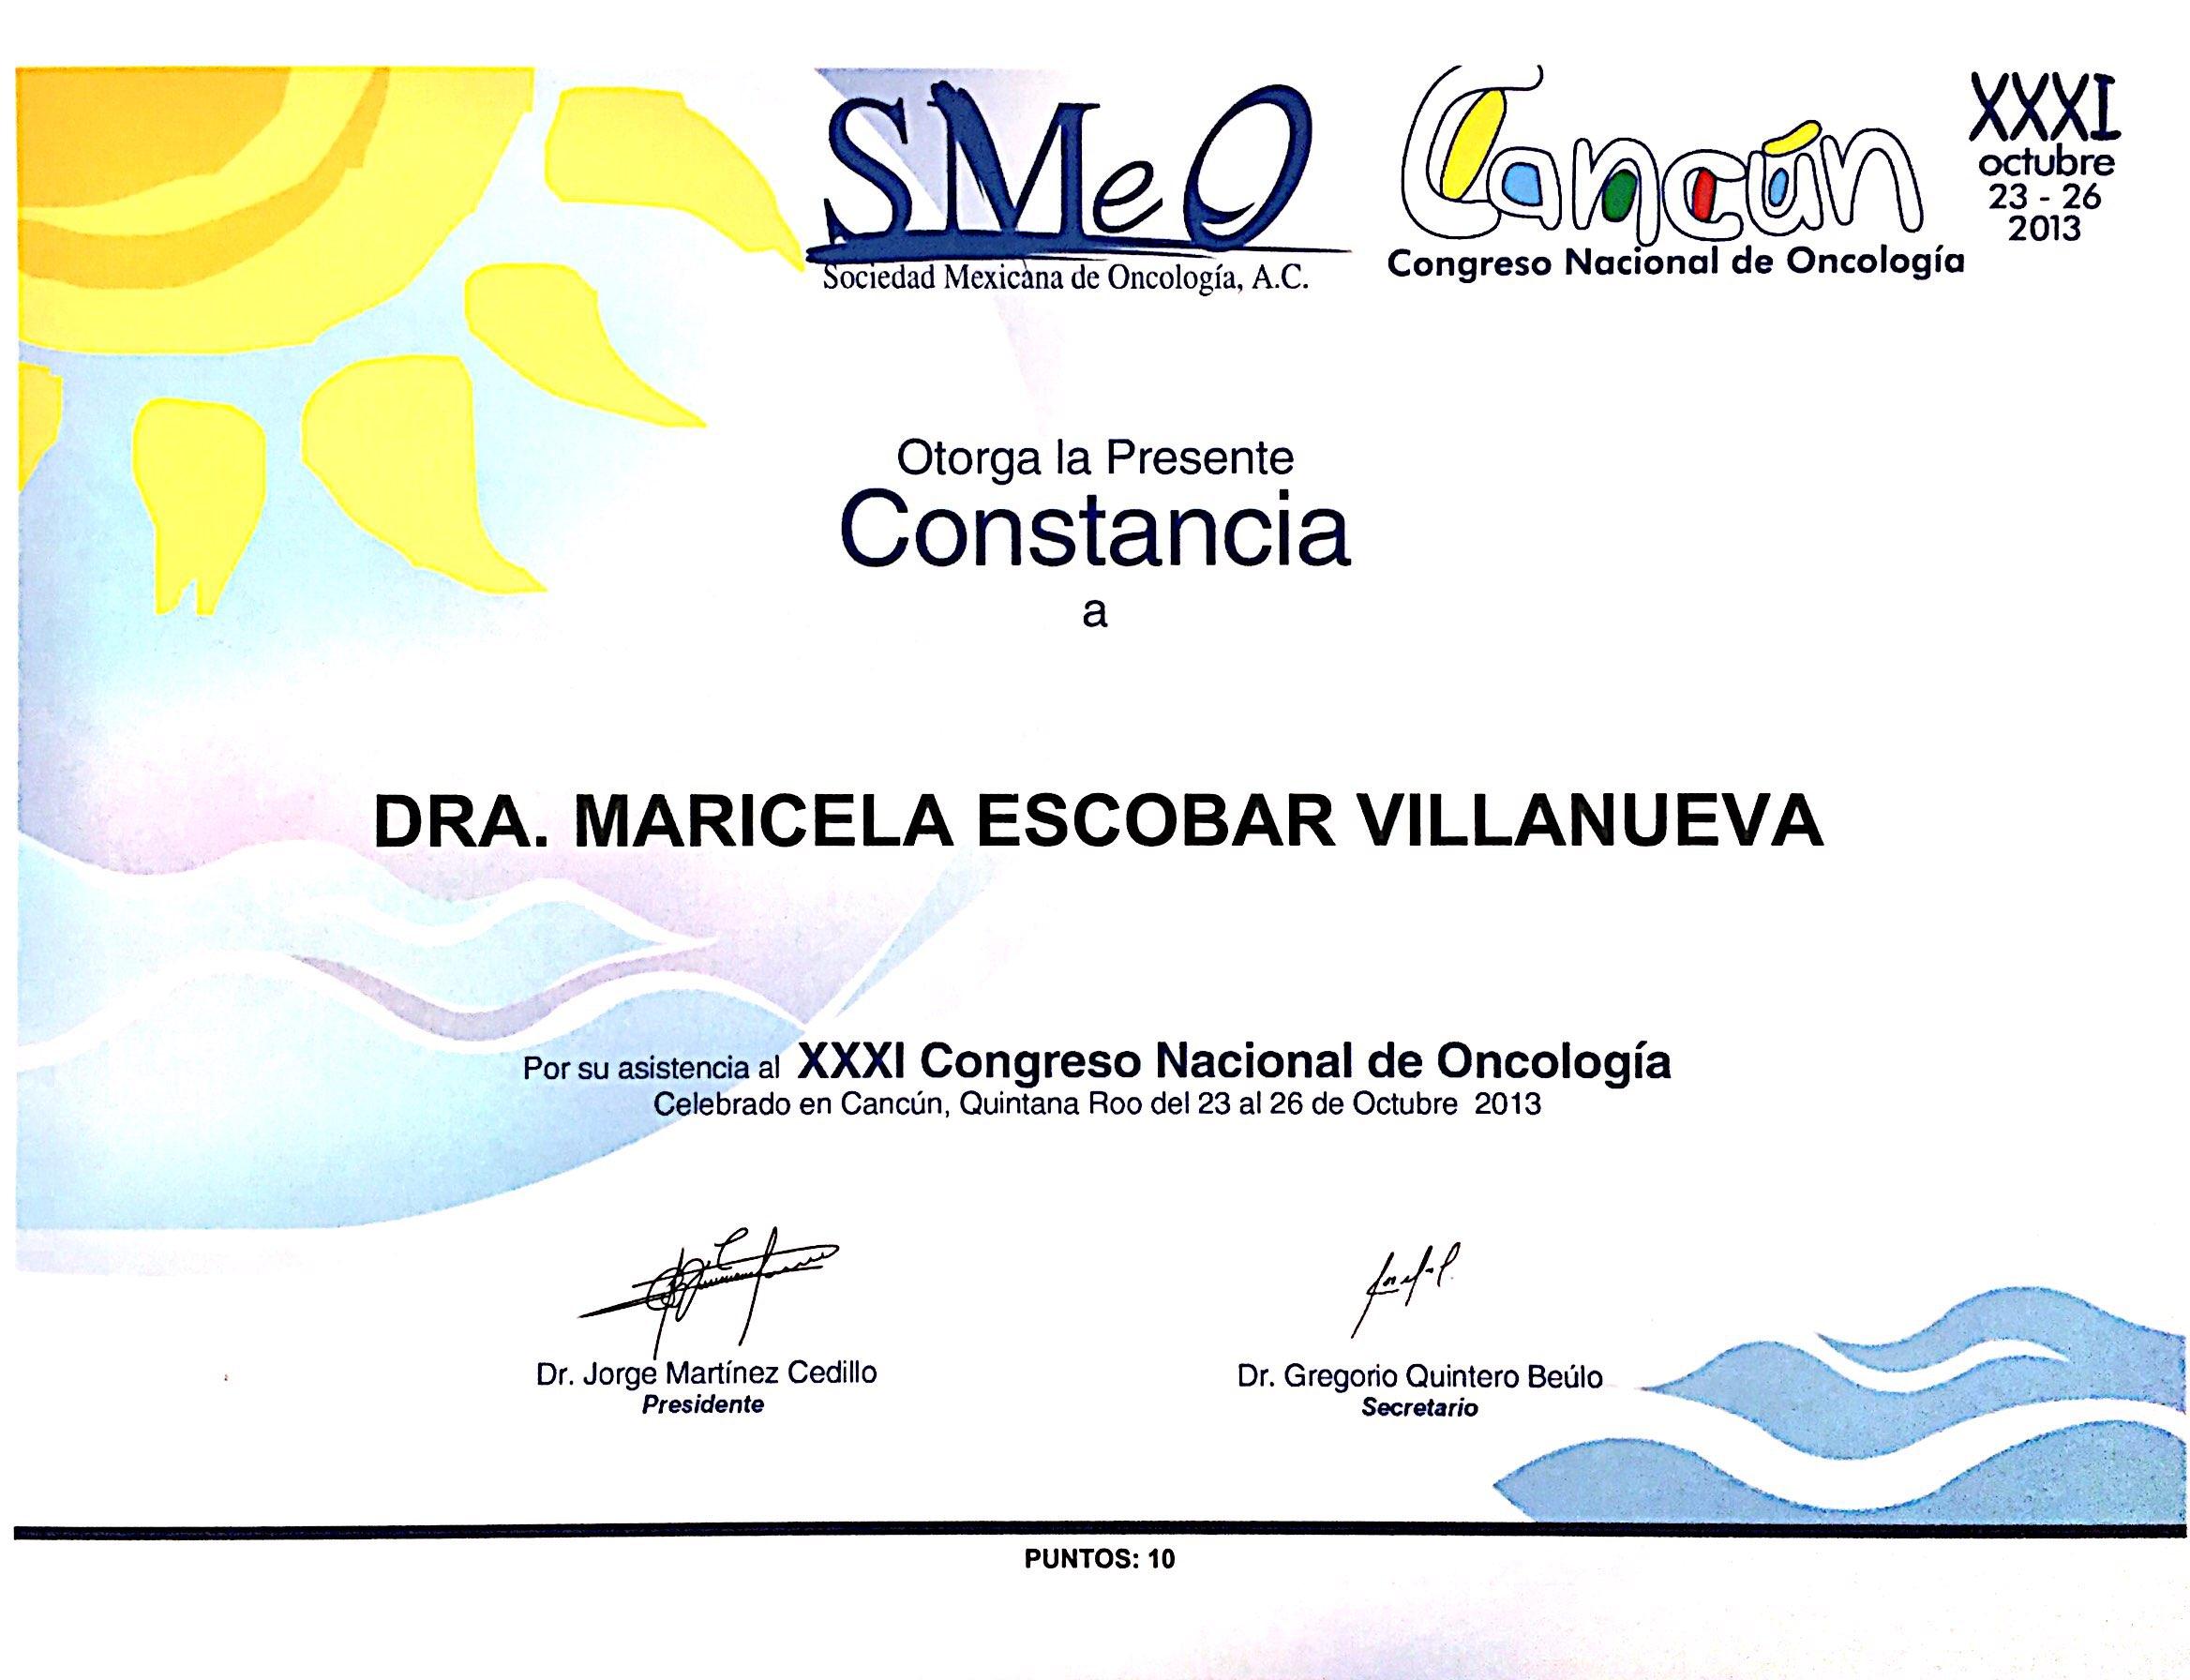 Nuevo doc 2018-02-20 11.21.39_34